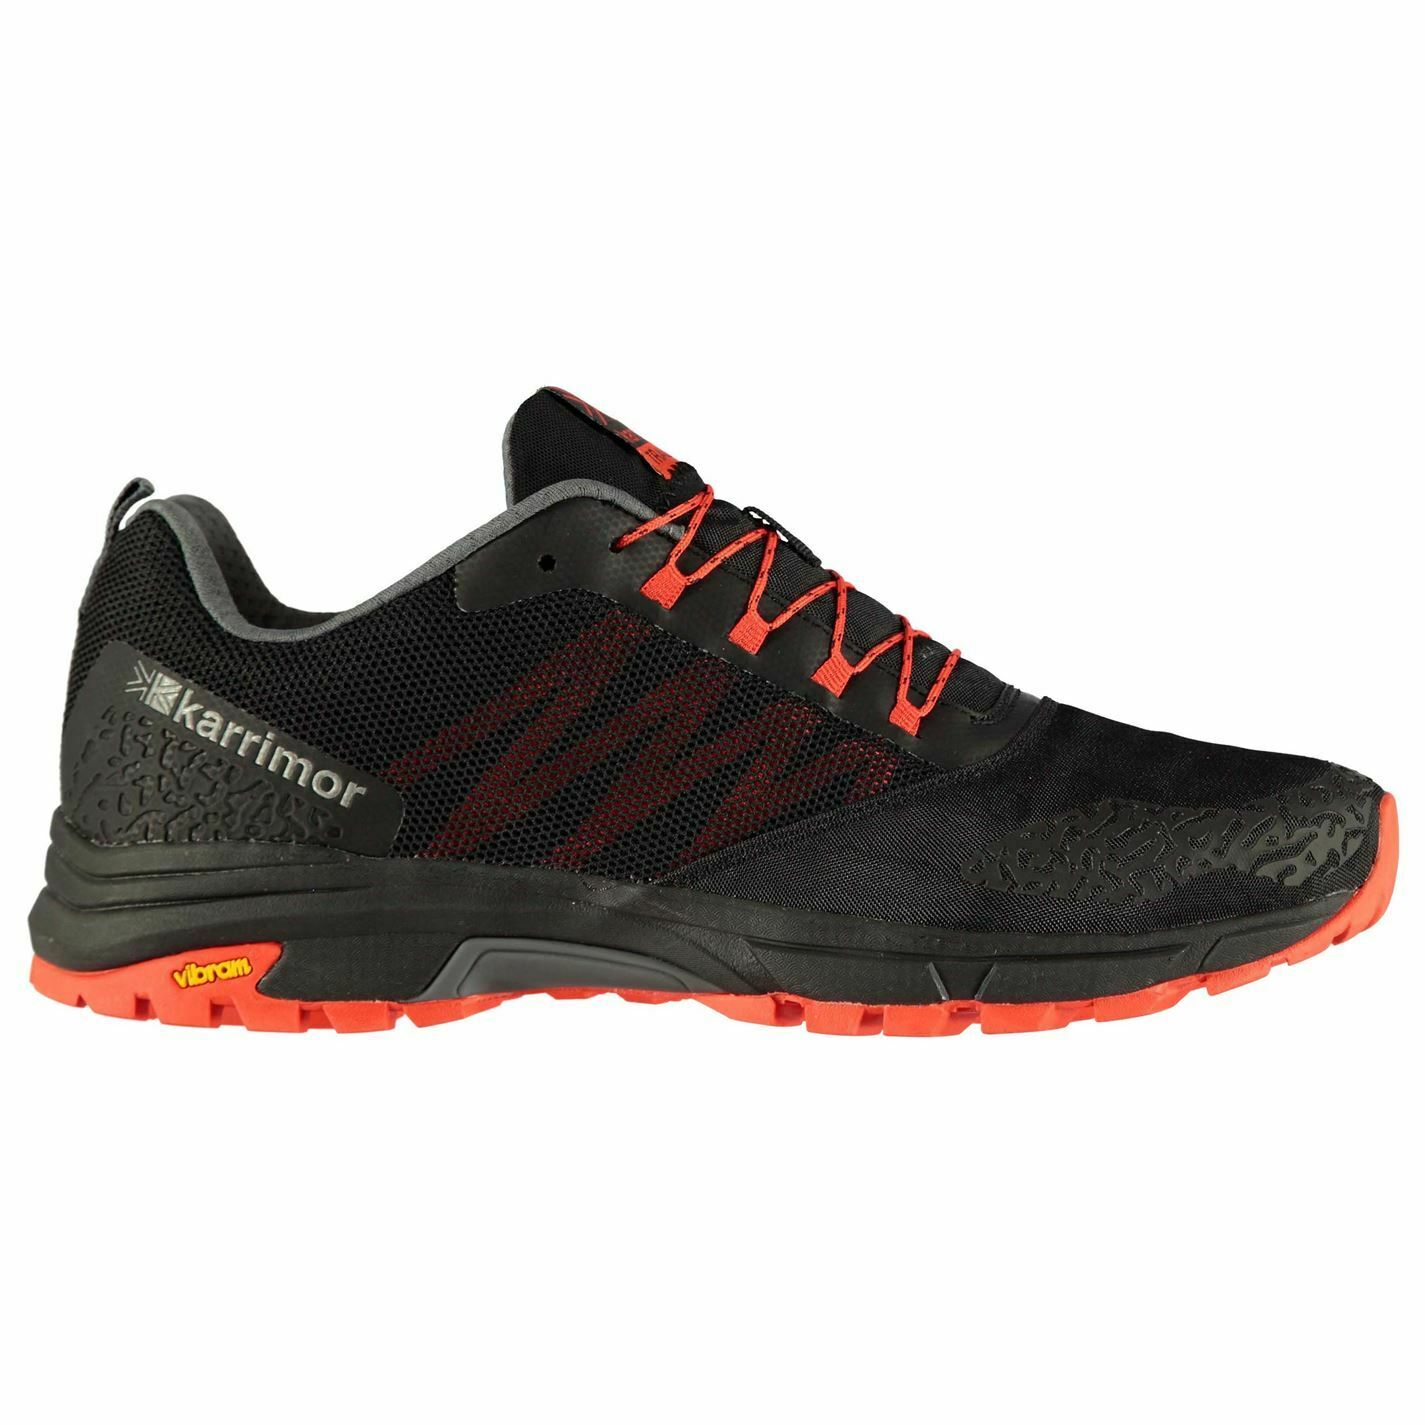 Karrimor Prova Scarpe Da Ginnastica Trail Running Scarpe da uomo